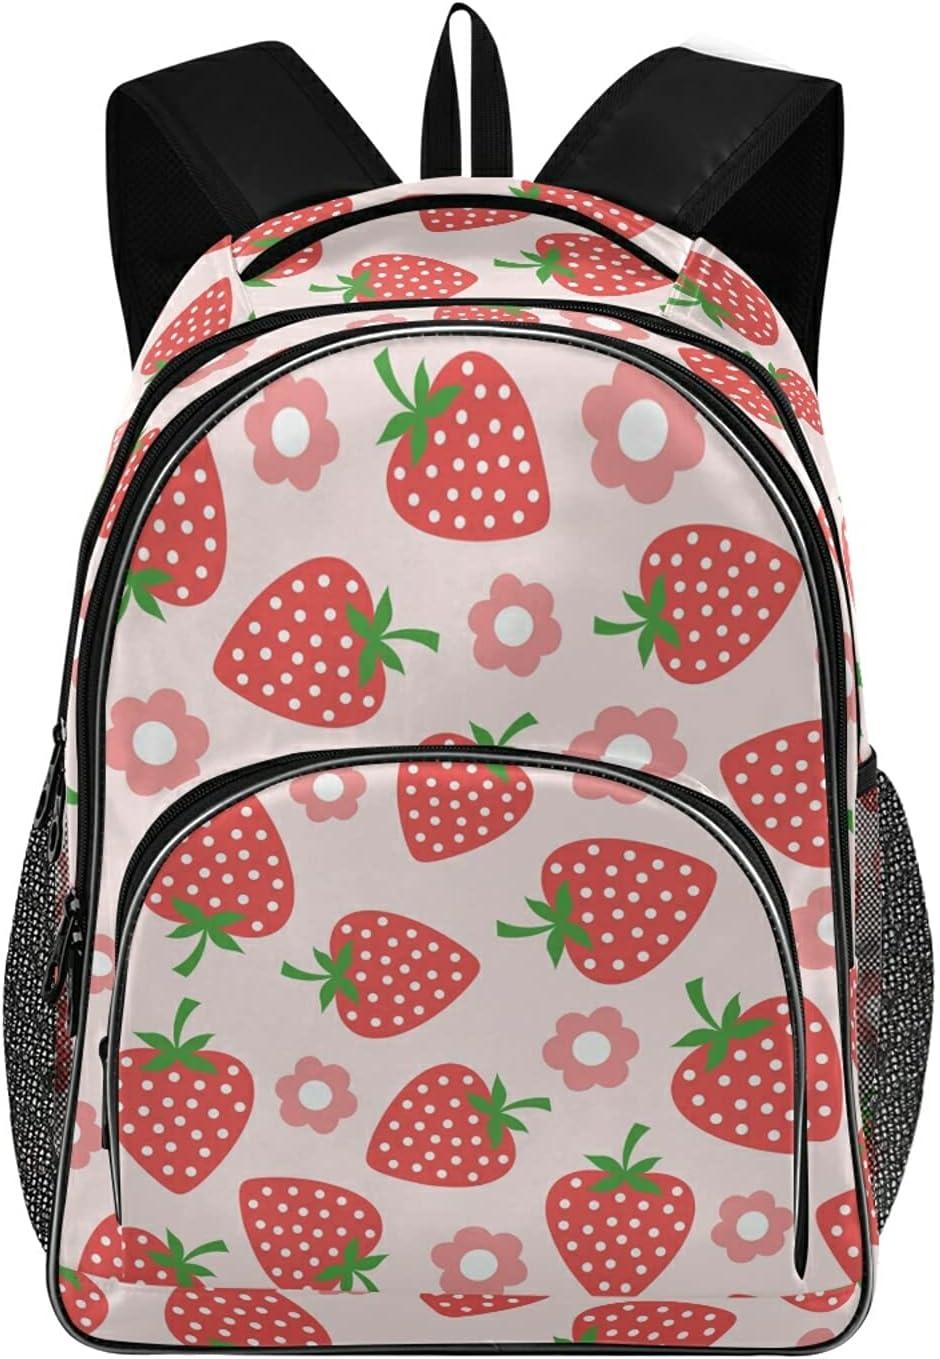 School Backpack Bookbag SALENEW very popular! Laptop Daypack Women Schoolbag for Girls Super popular specialty store